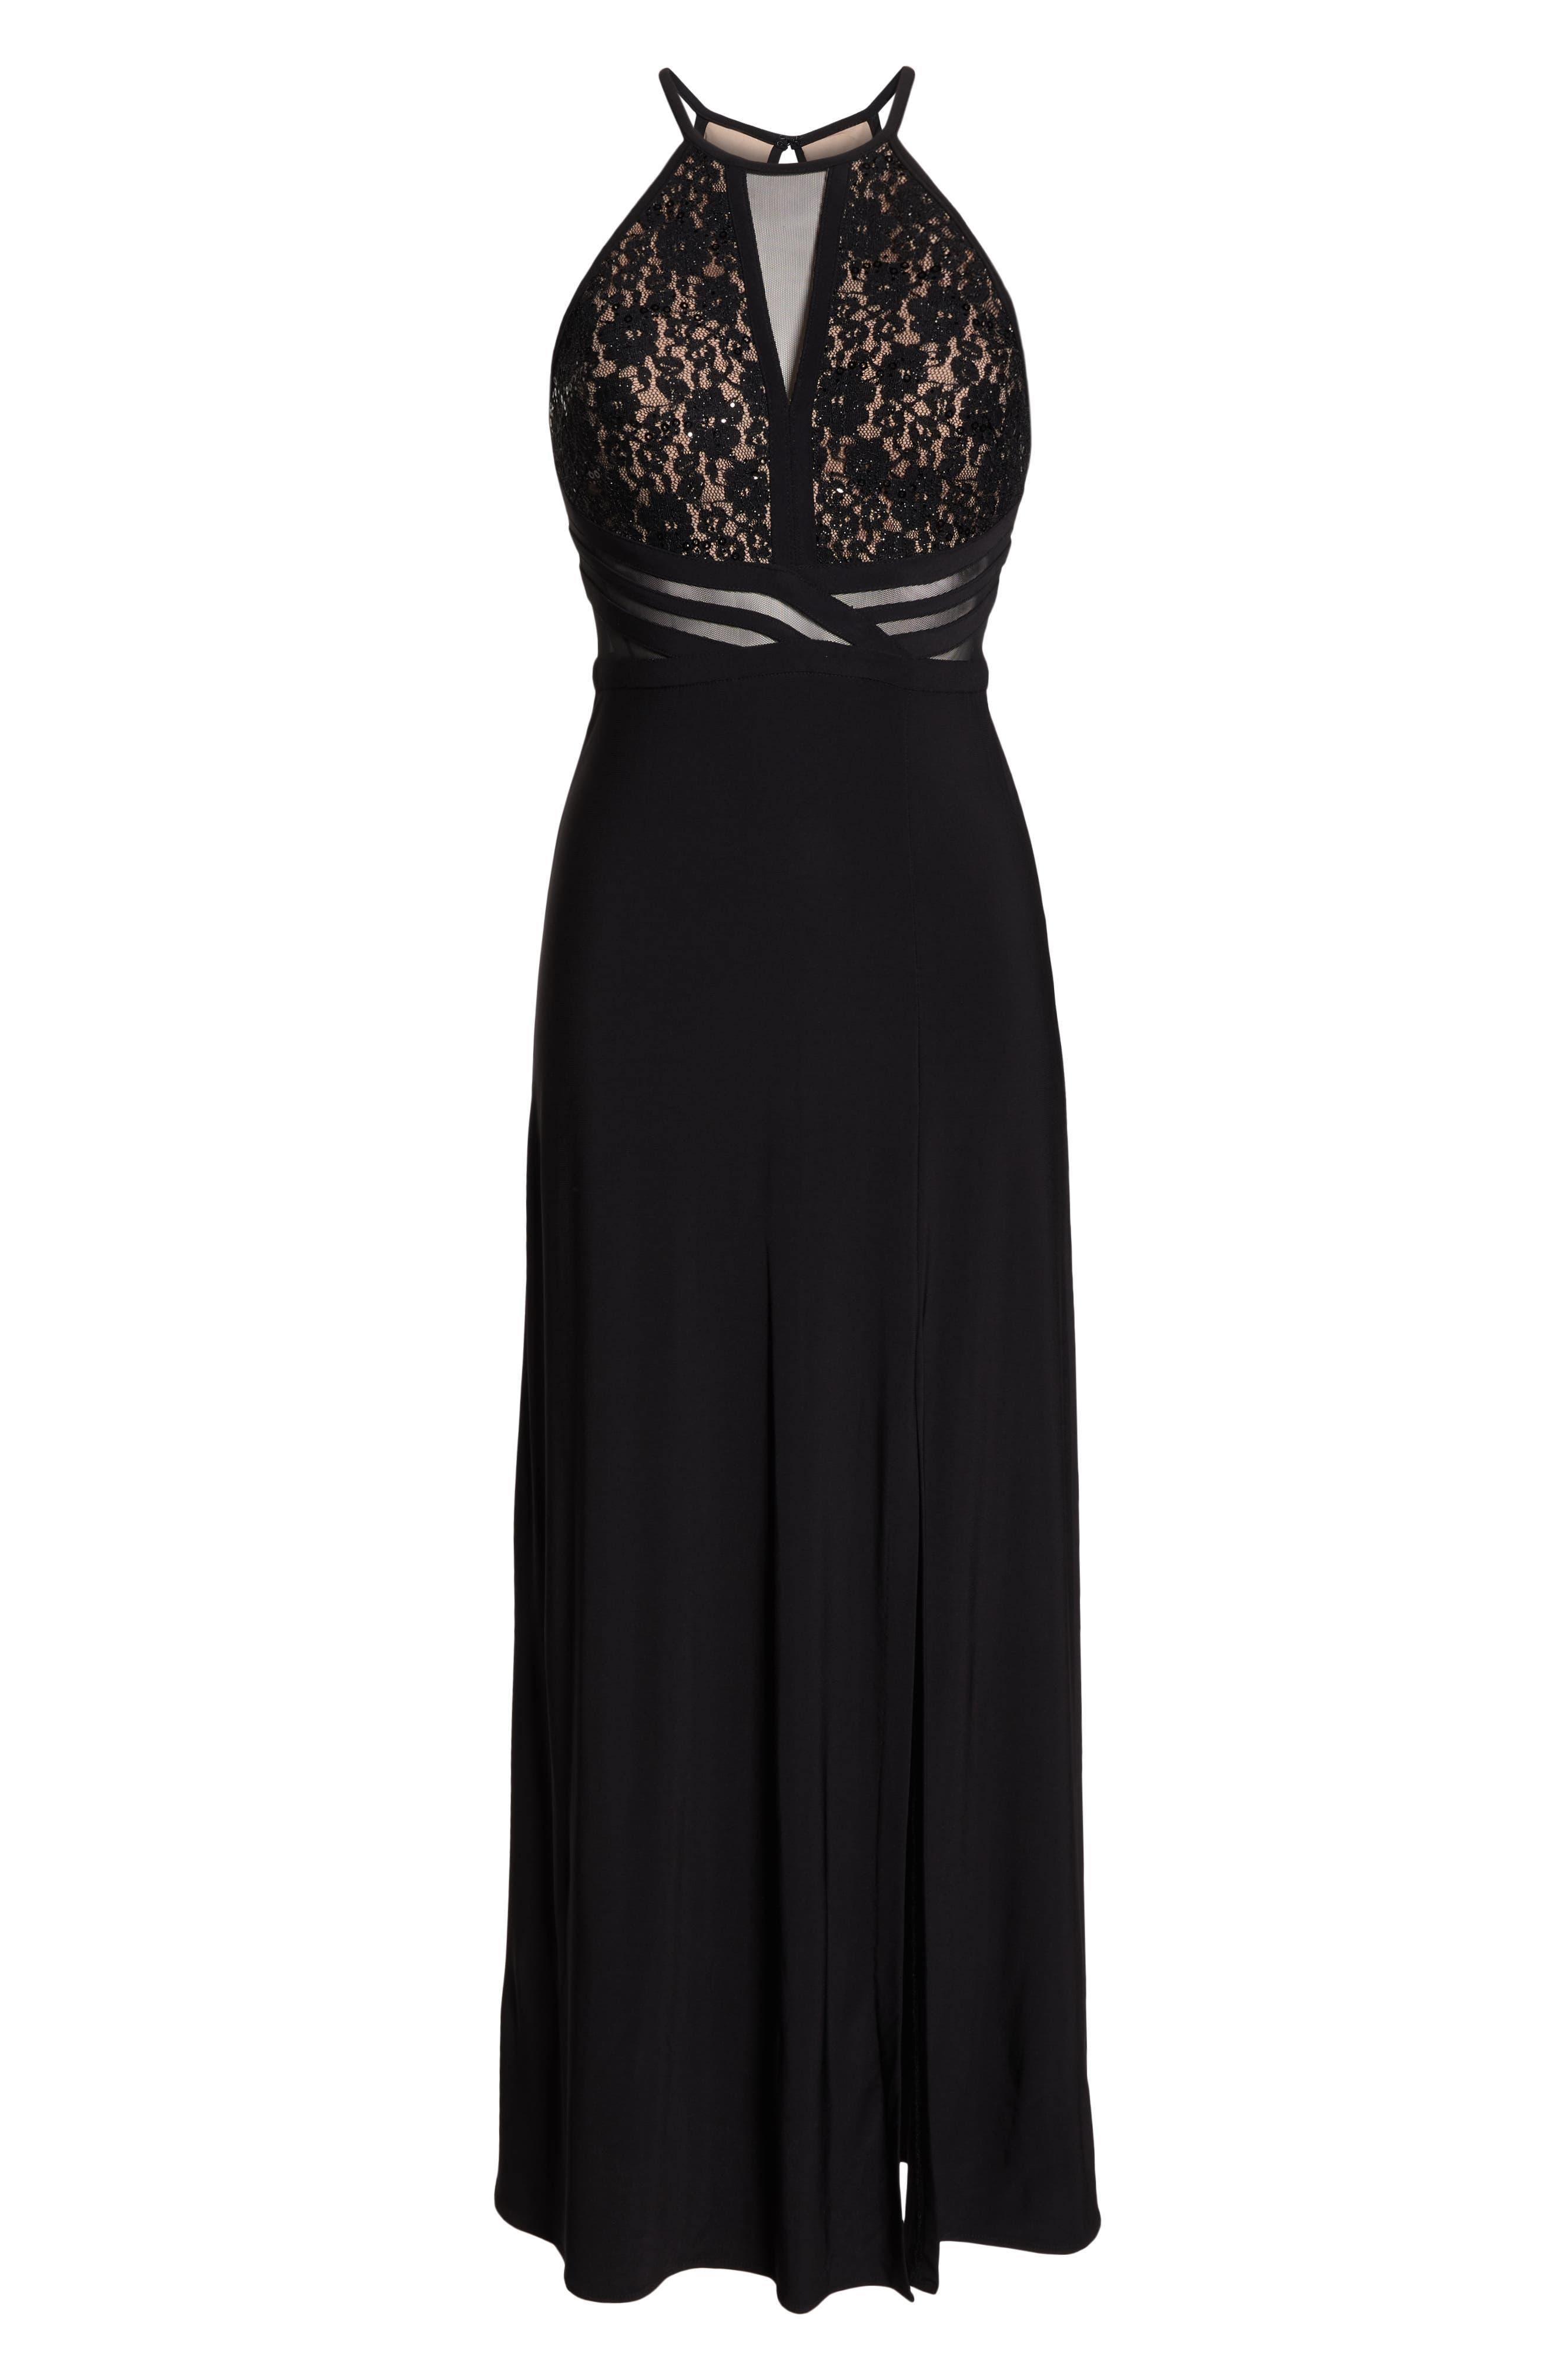 MORGAN & CO.,                             Lace & Illusion Mesh Bodice Gown,                             Alternate thumbnail 7, color,                             BLACK/ NUDE